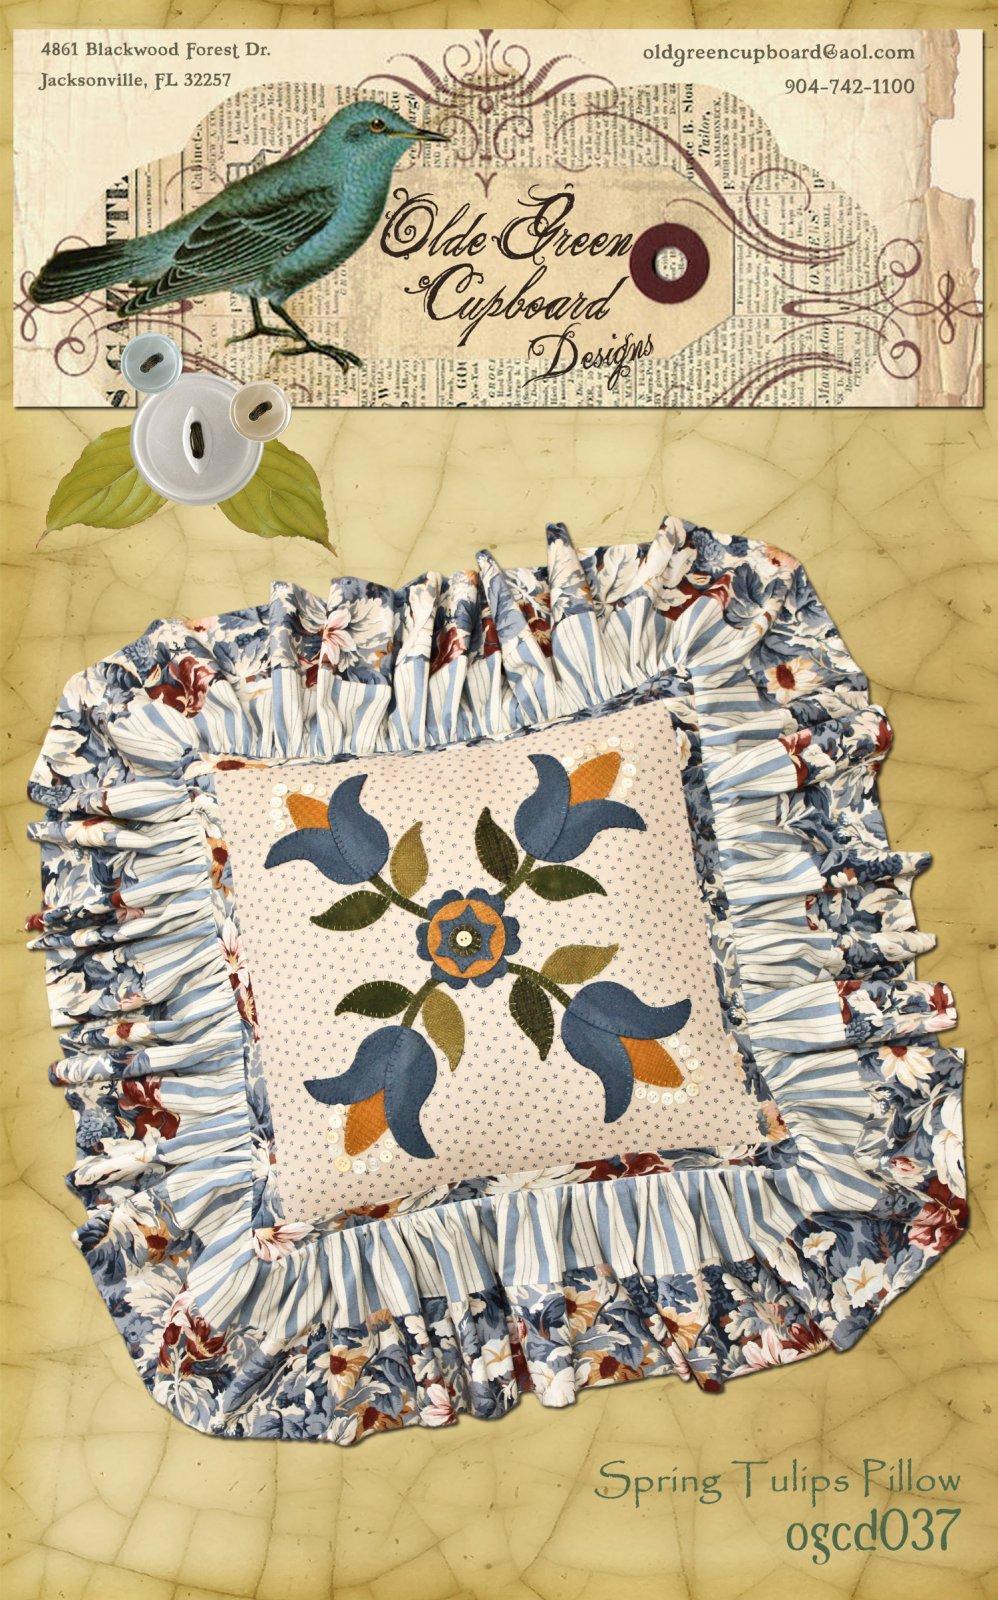 Spring Tulips Pillow Pattern - OGCD037